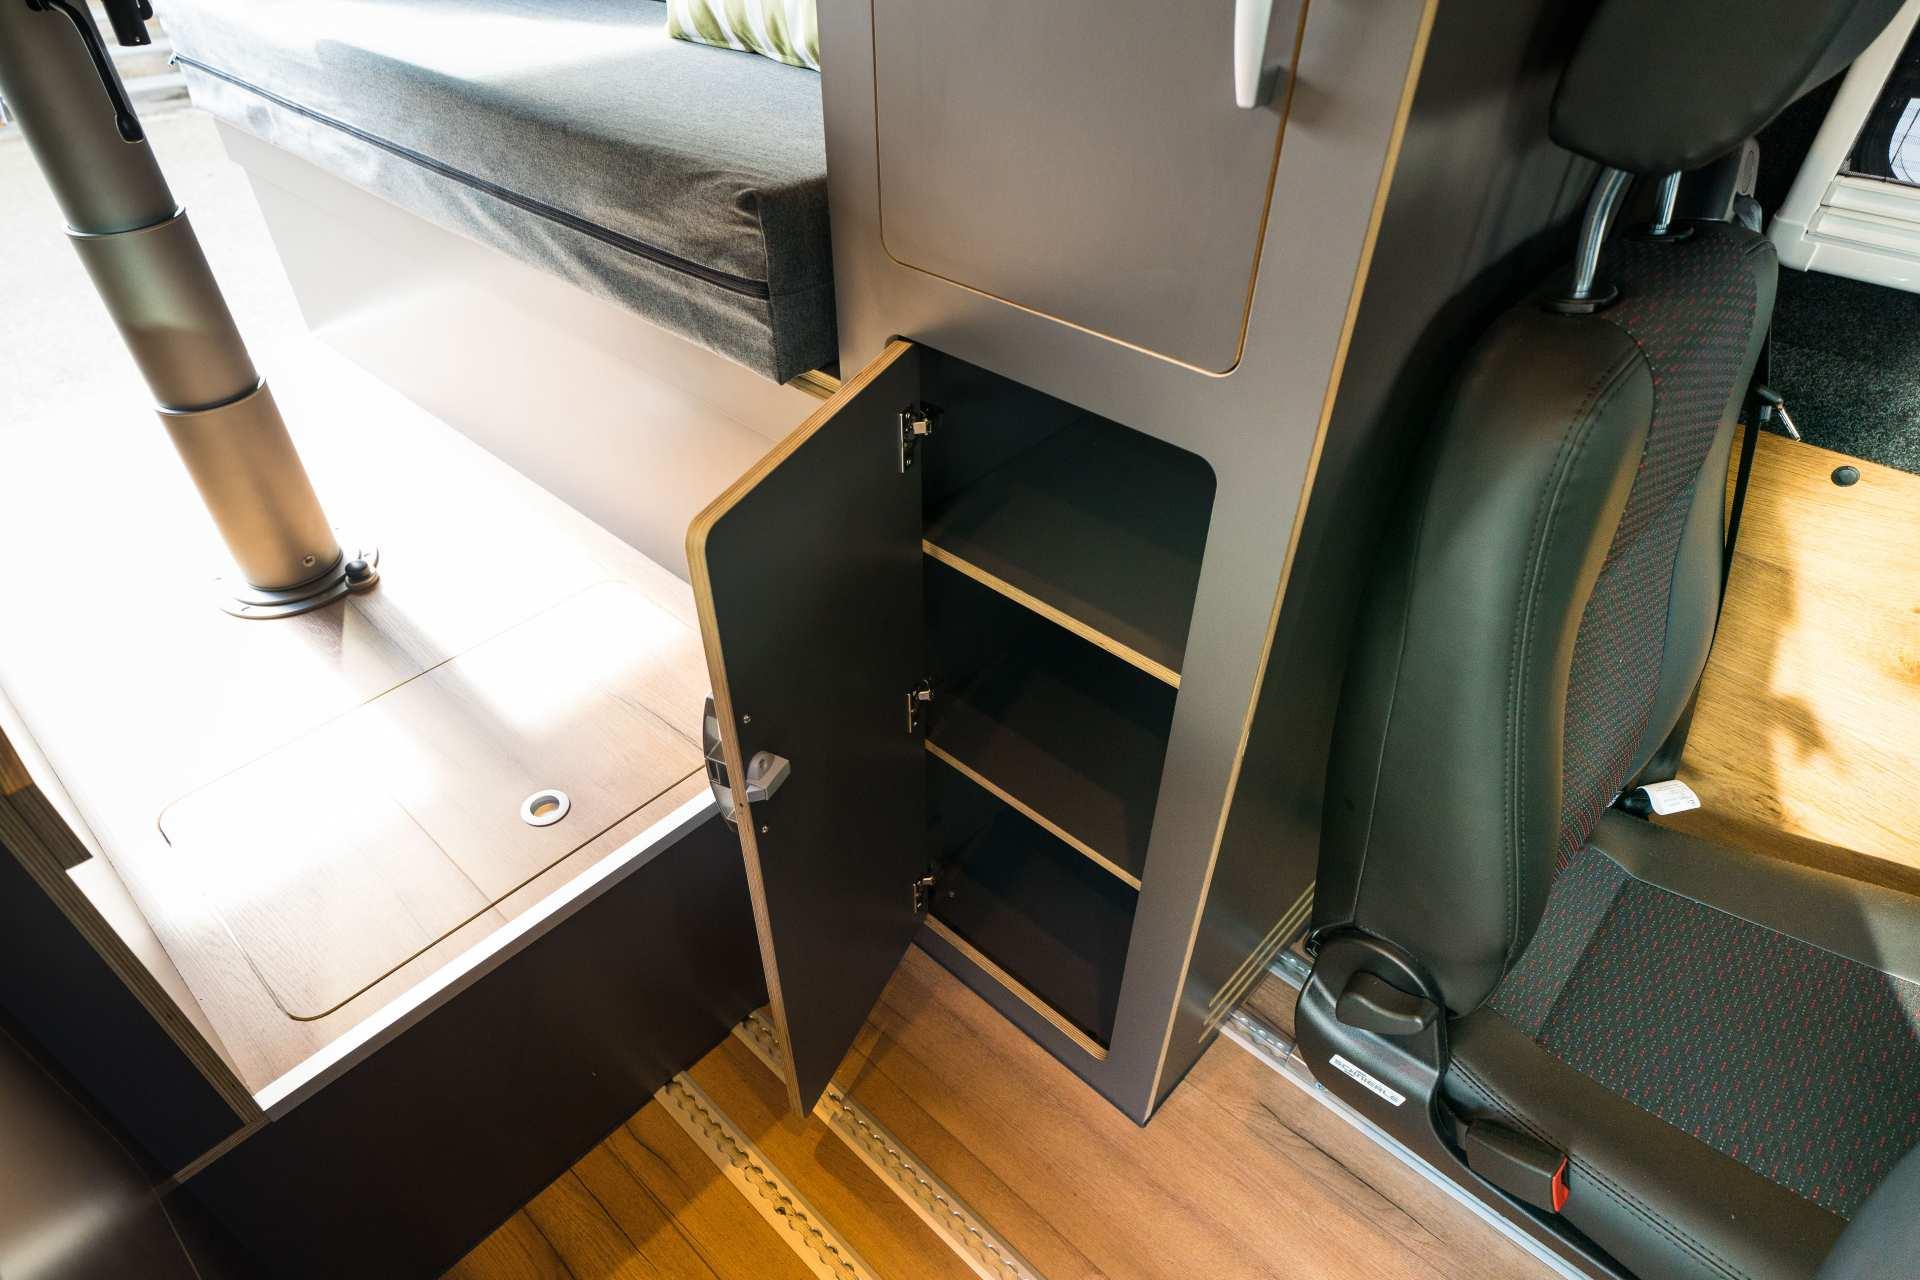 Individualausbau: Zwei-Raumwohnung Peugeot Boxer L2 H2 - 26